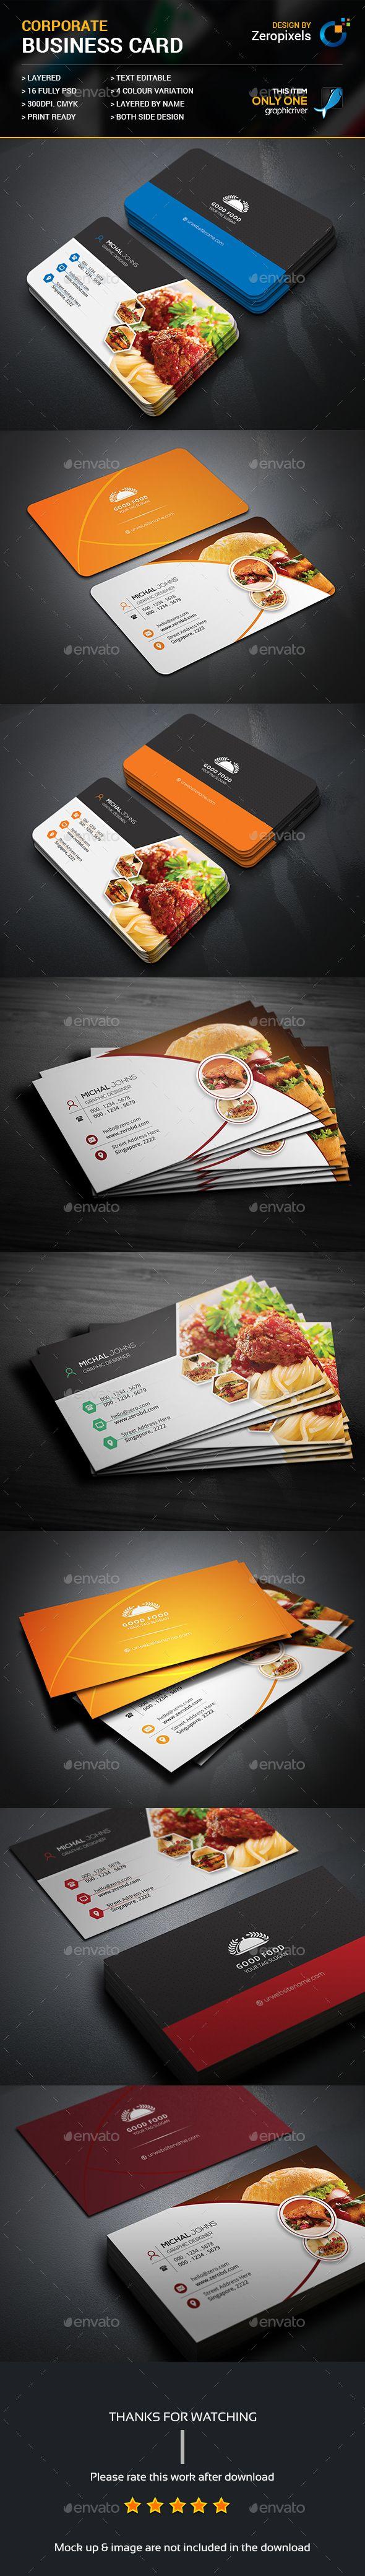 Restaurant business card templates psd bundle pinteres restaurant business card templates psd bundle more flashek Choice Image